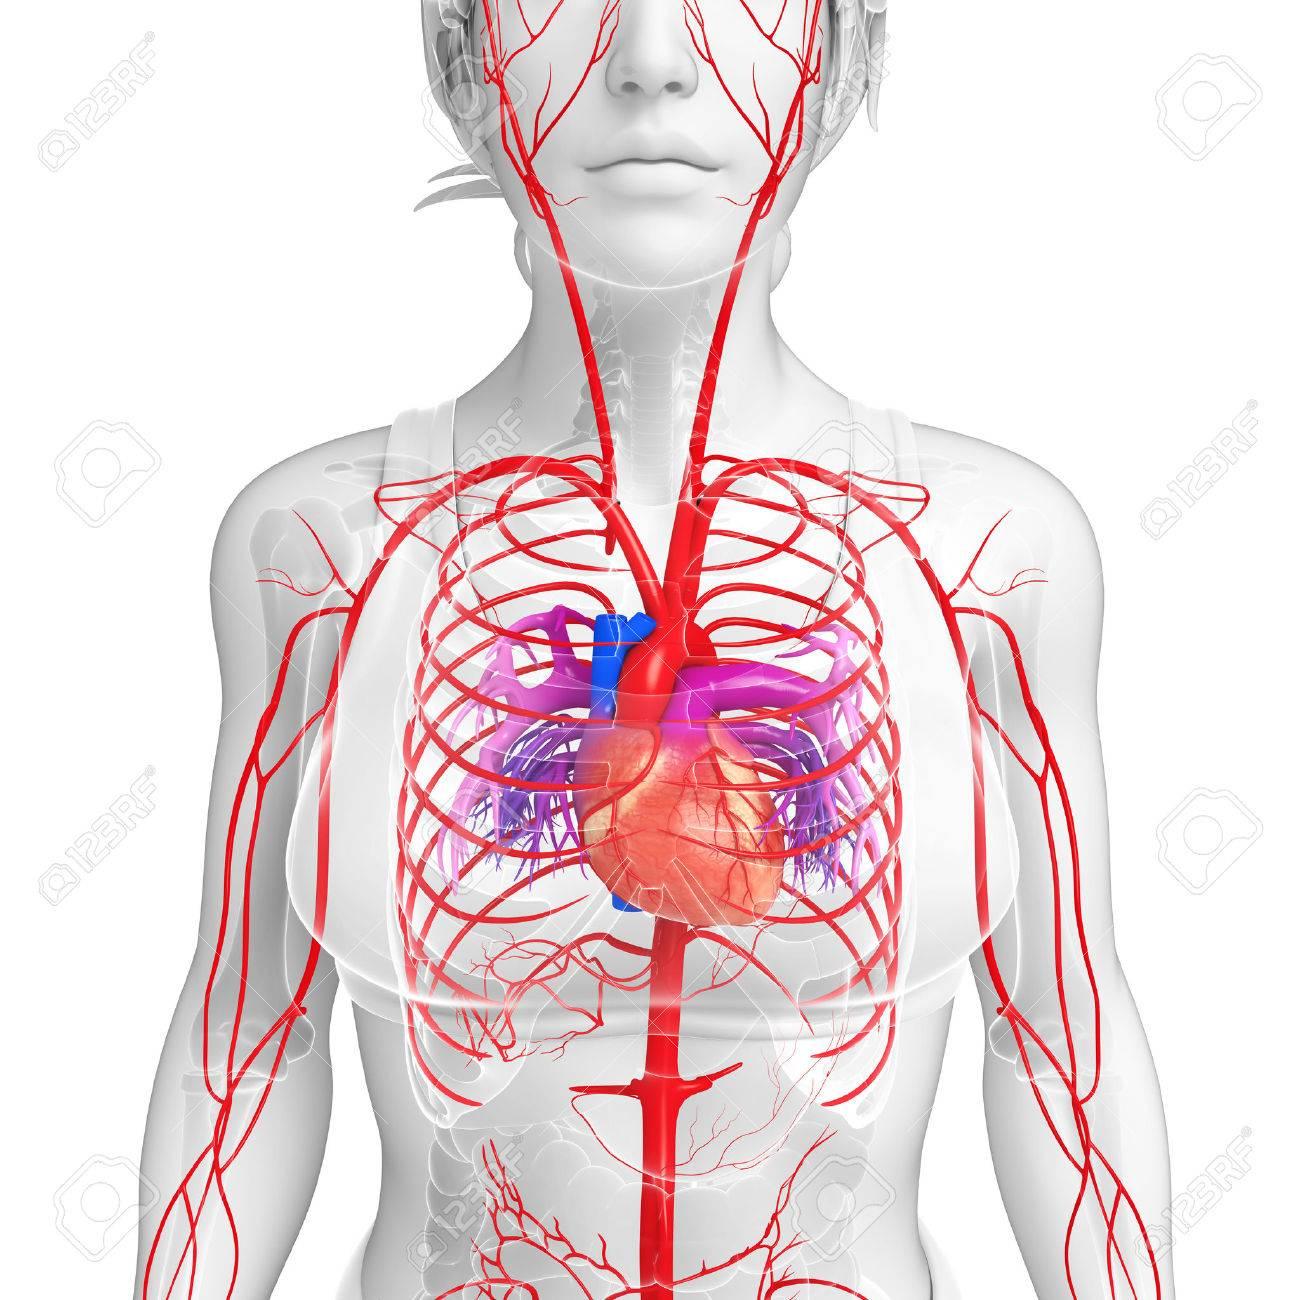 3d Rendered Illustration Of Female Arterial System Stock Photo ...